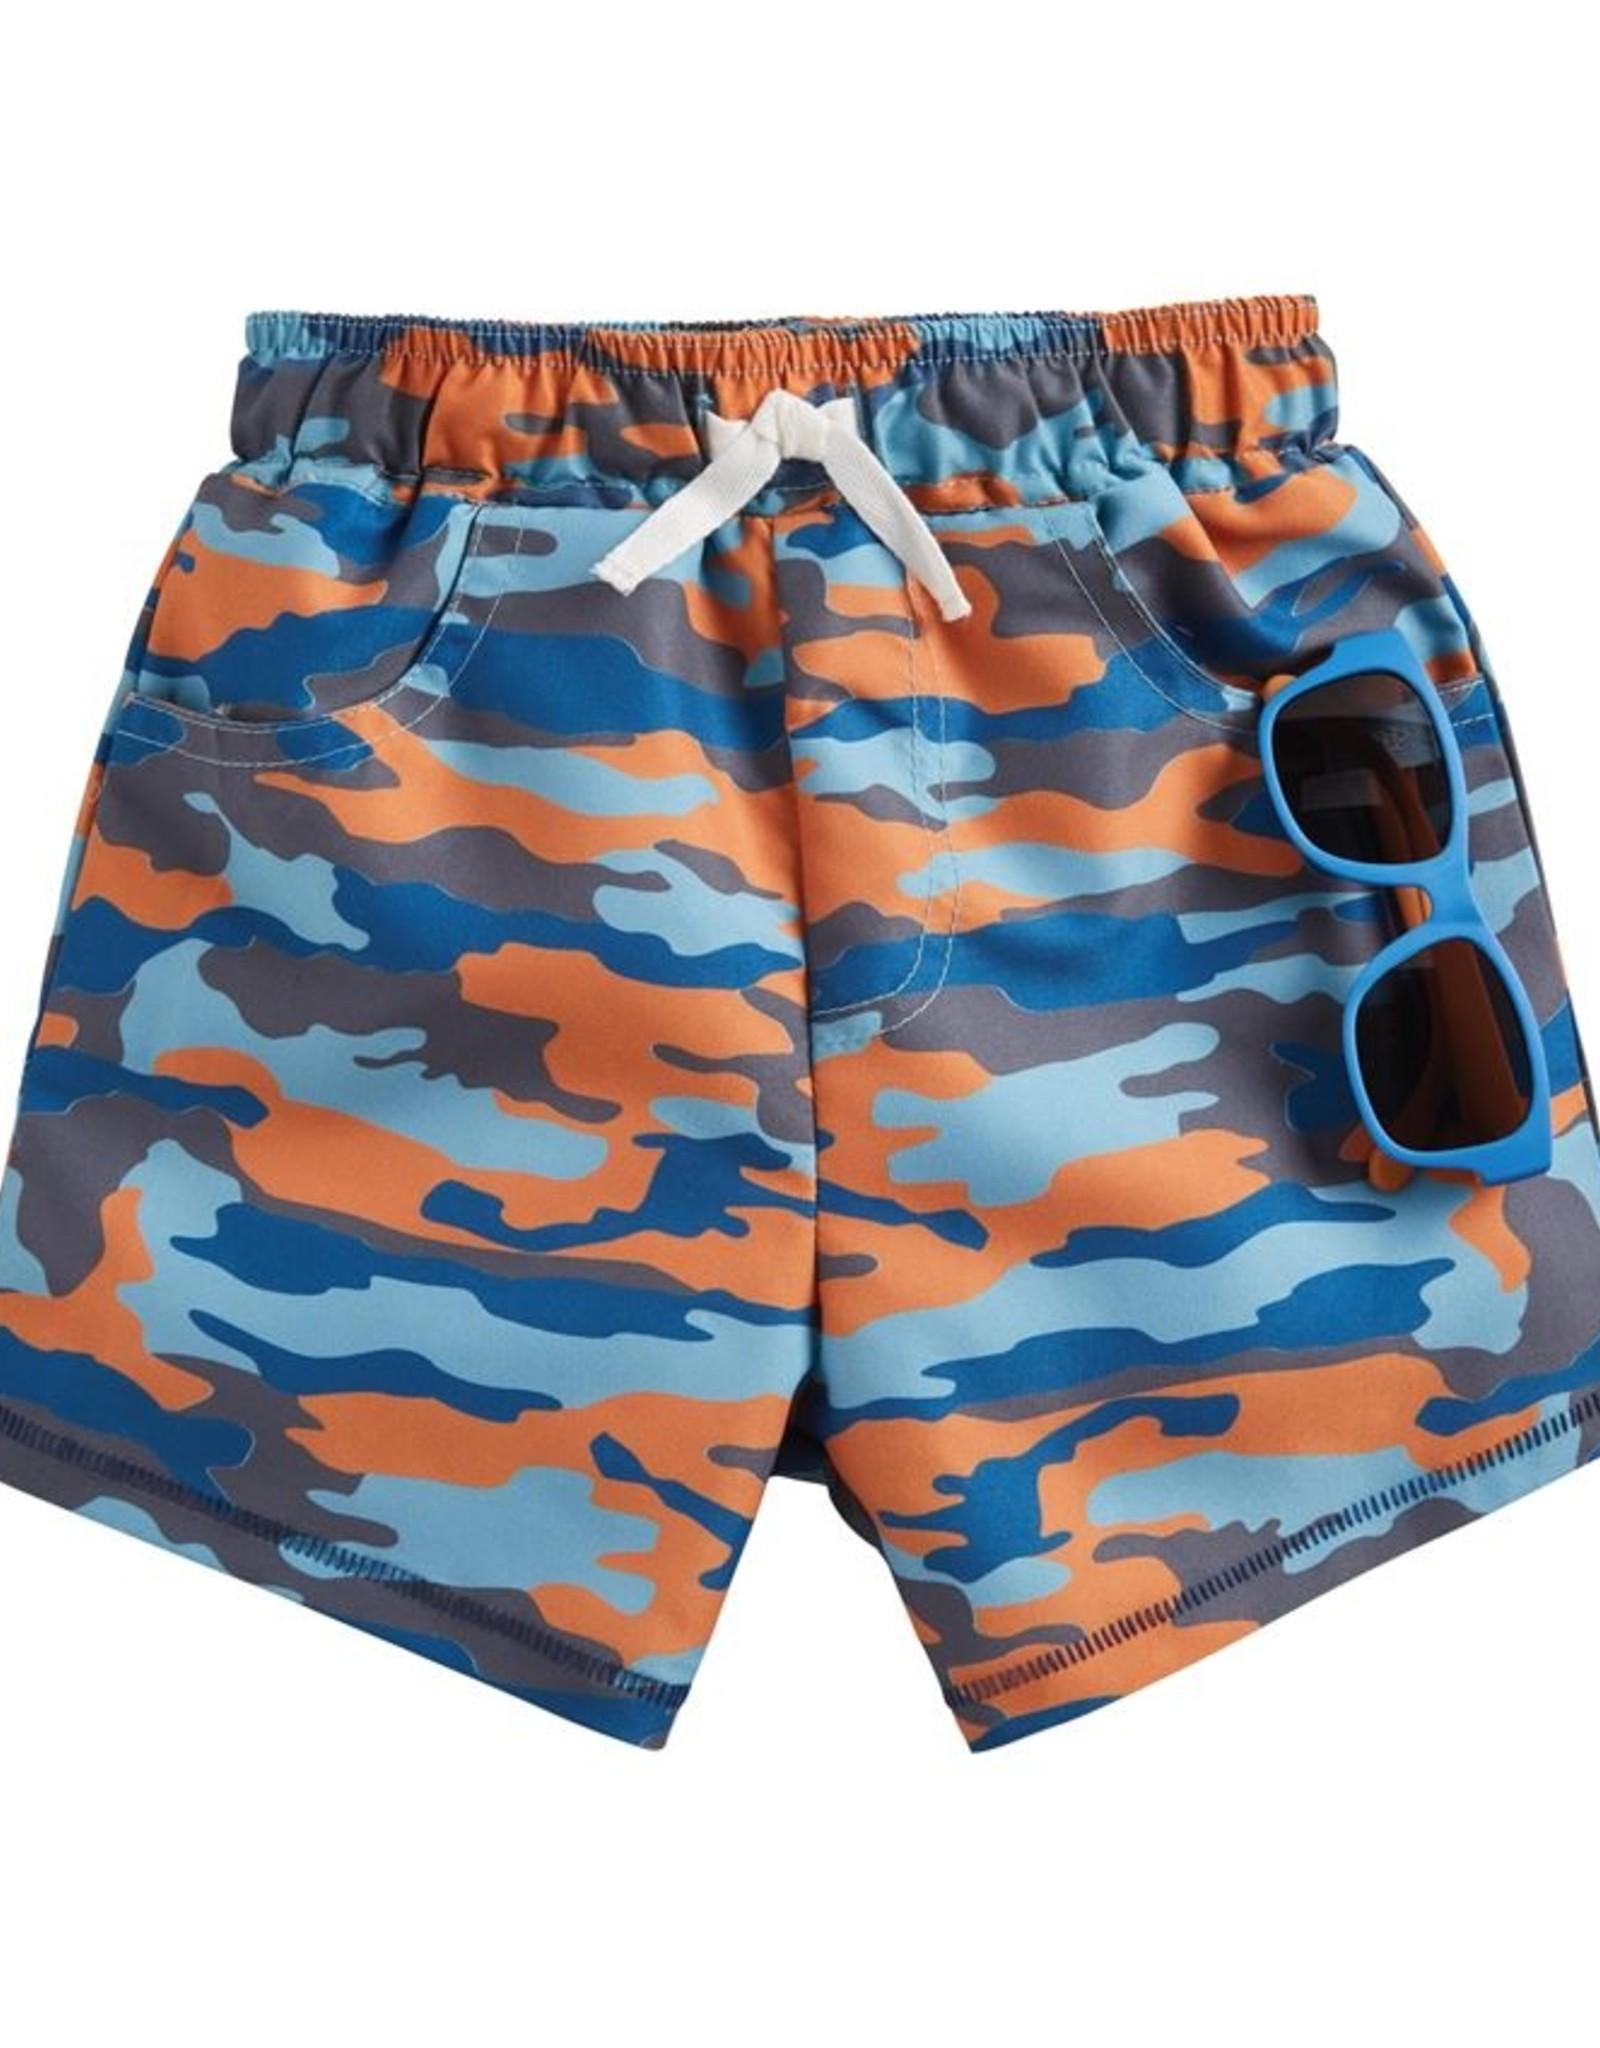 Mud Pie Camo Swim Trunks w/ Sunglasses